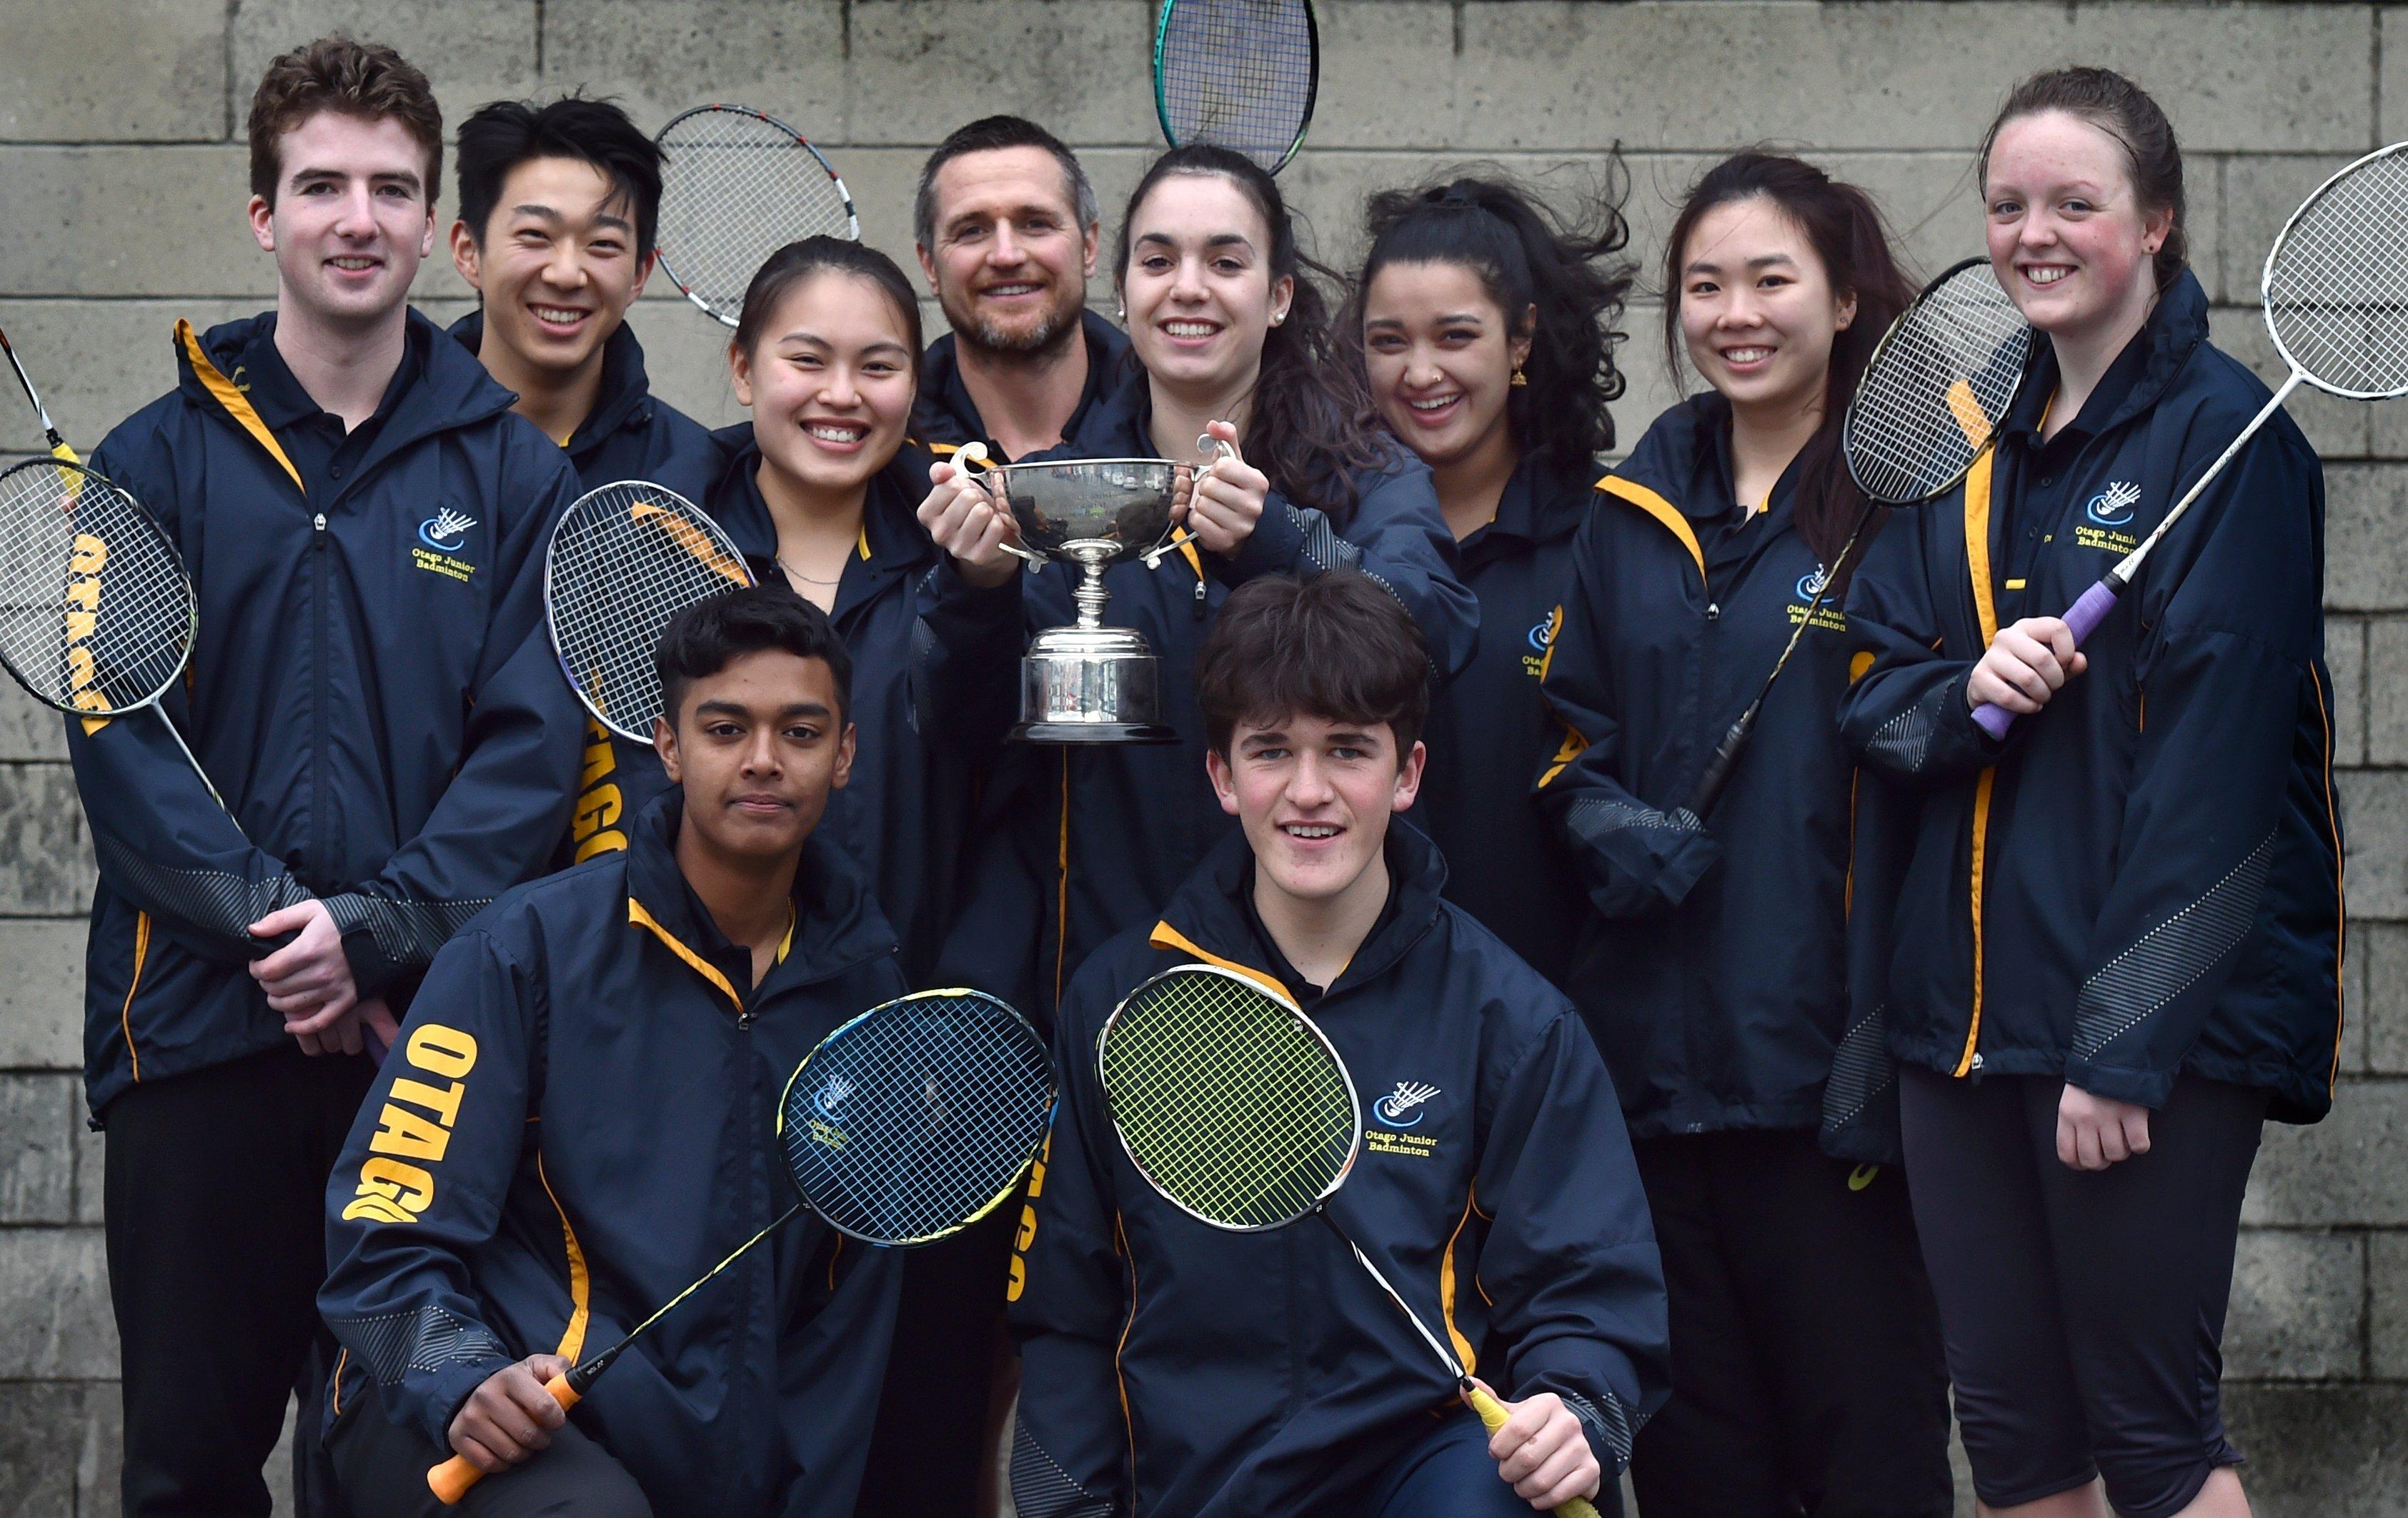 The Neill Cup-winning Otago badminton team of (back row, from left) Josh Kellet, Michael Zhang,...